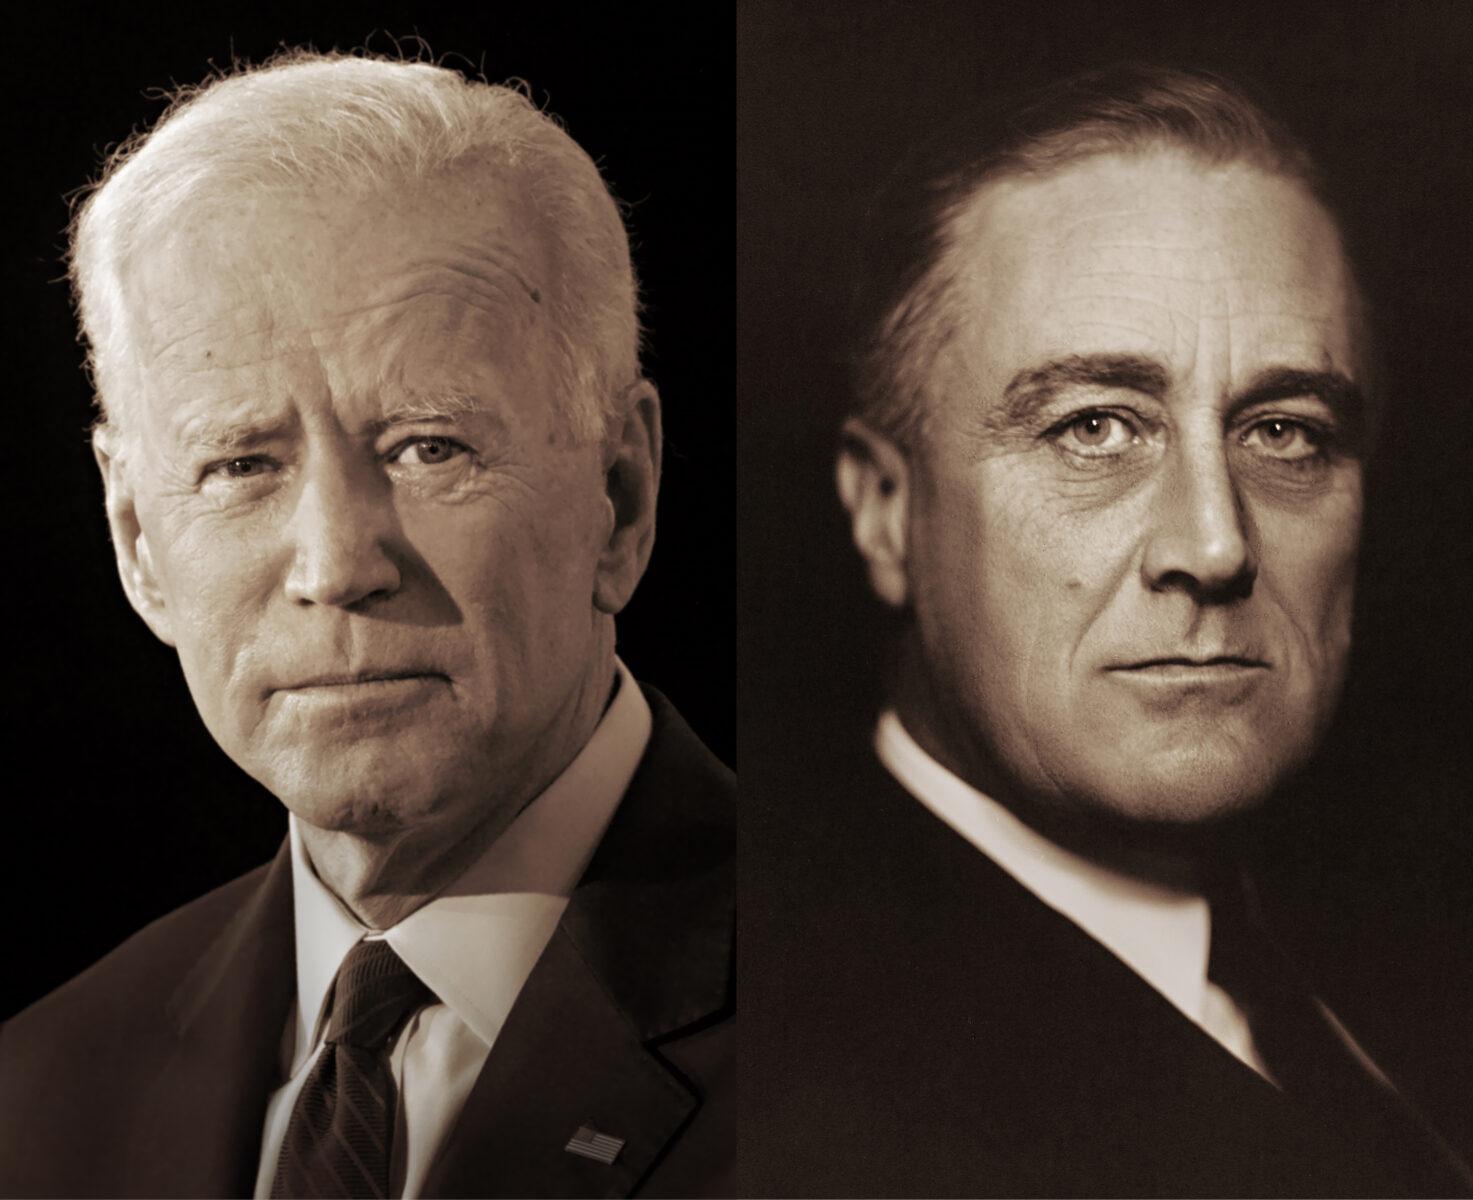 Yhdysvaltain 46. presidentti Joe Biden ja Yhdysvaltain 32. presidentti Franklin D. Roosevelt.